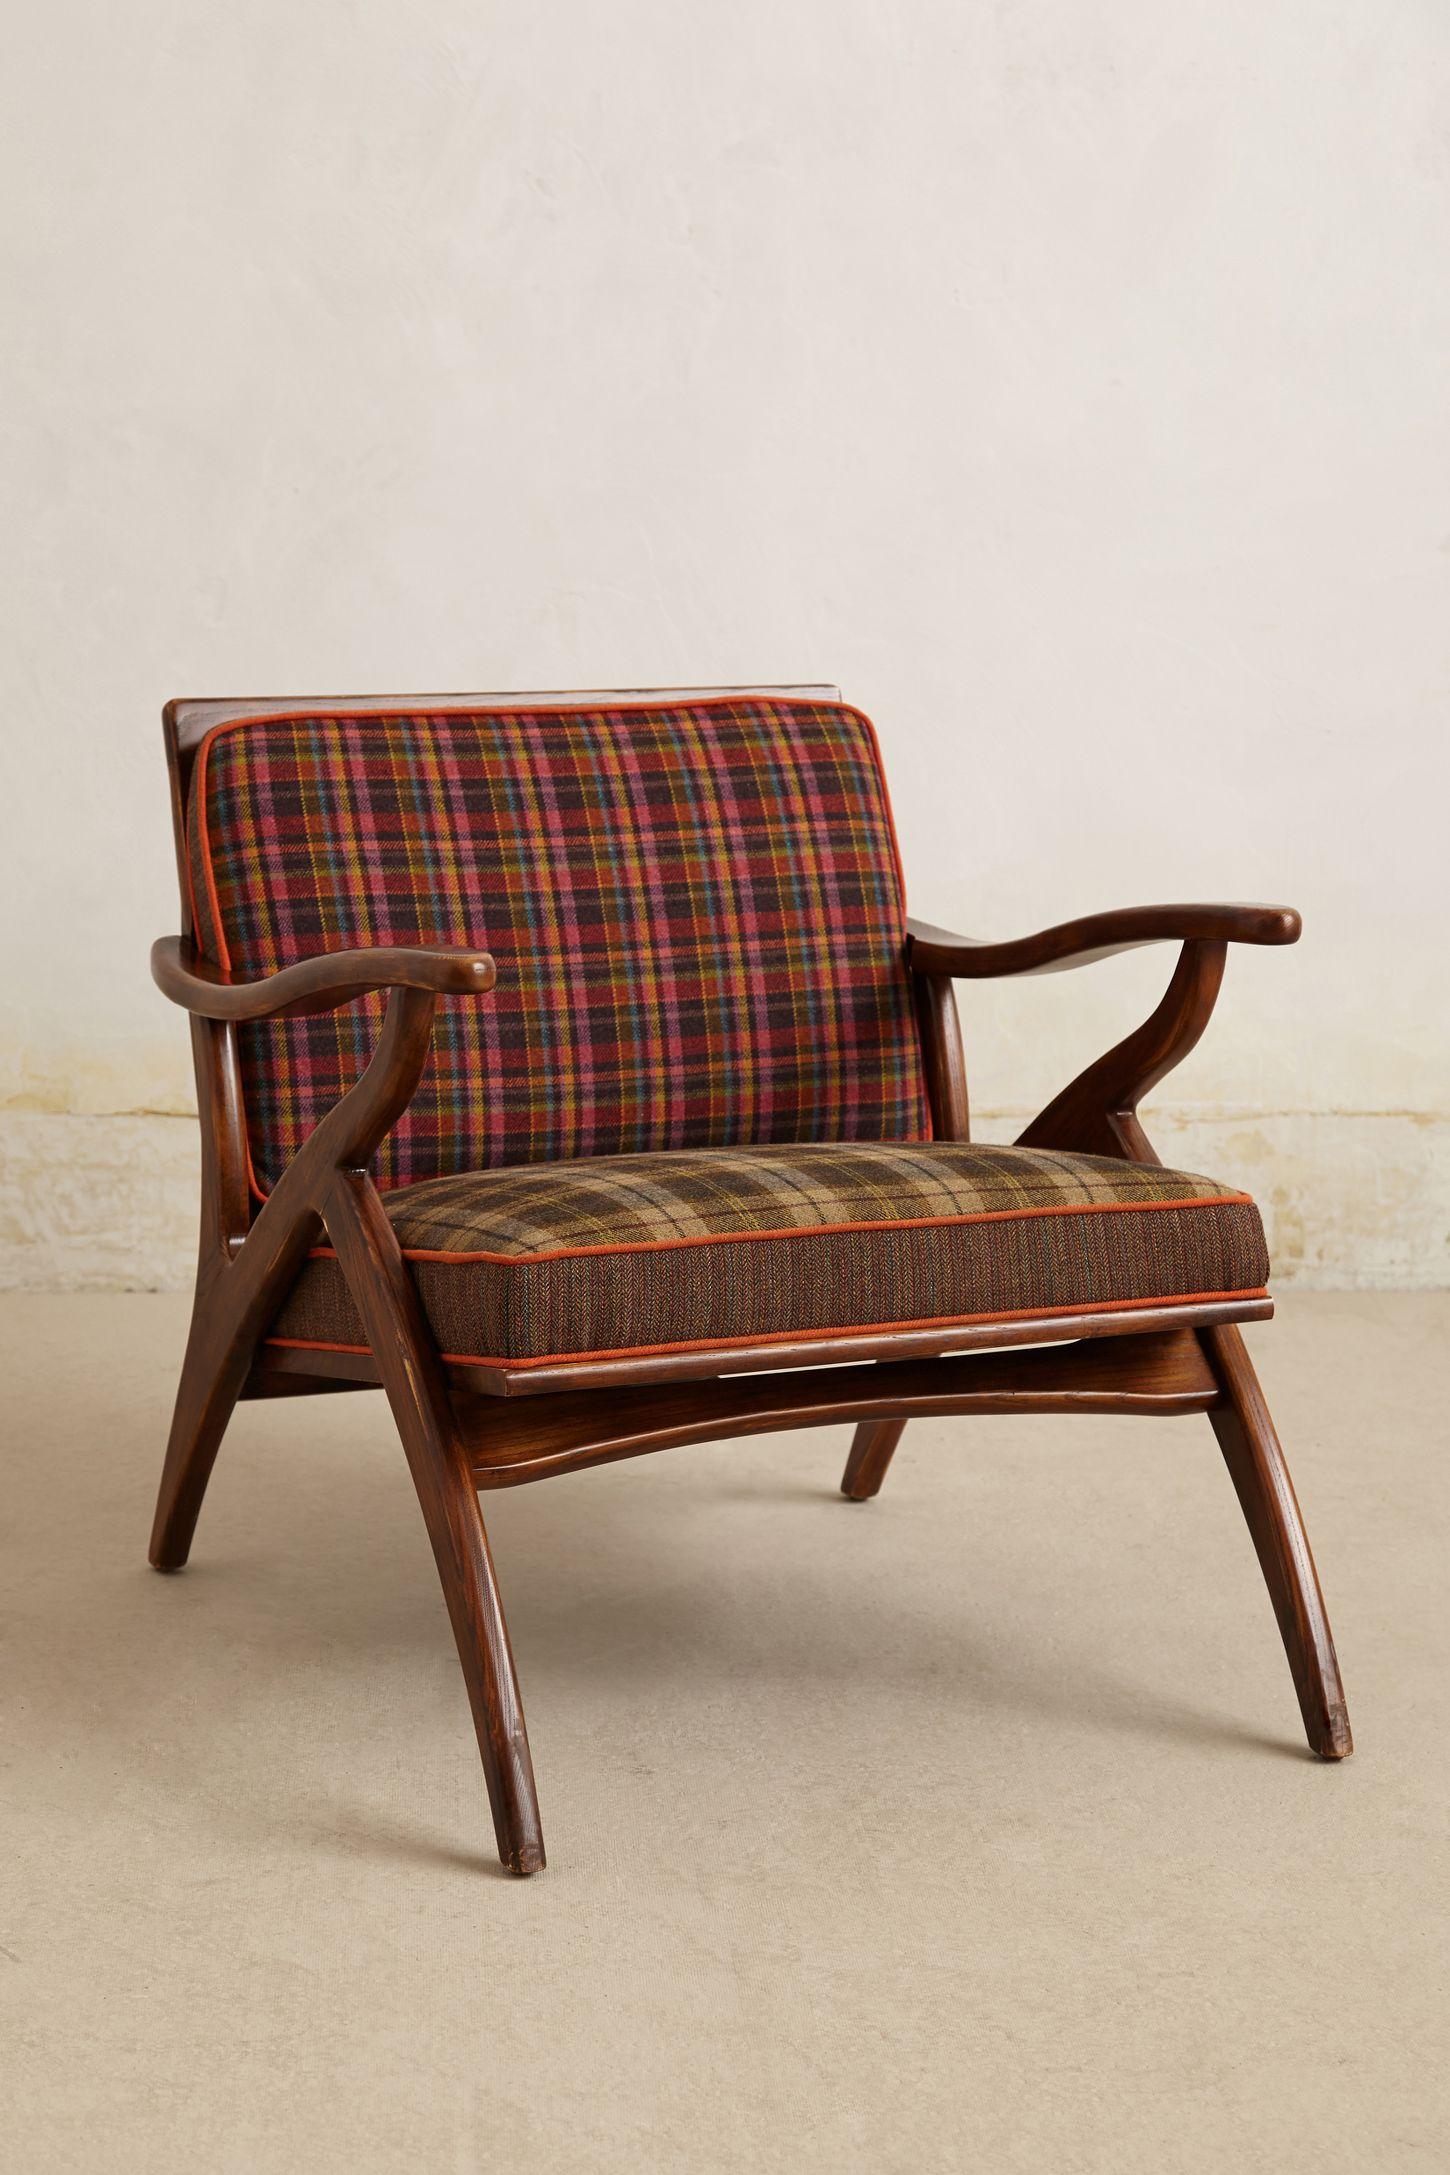 Inge Chair Plaid